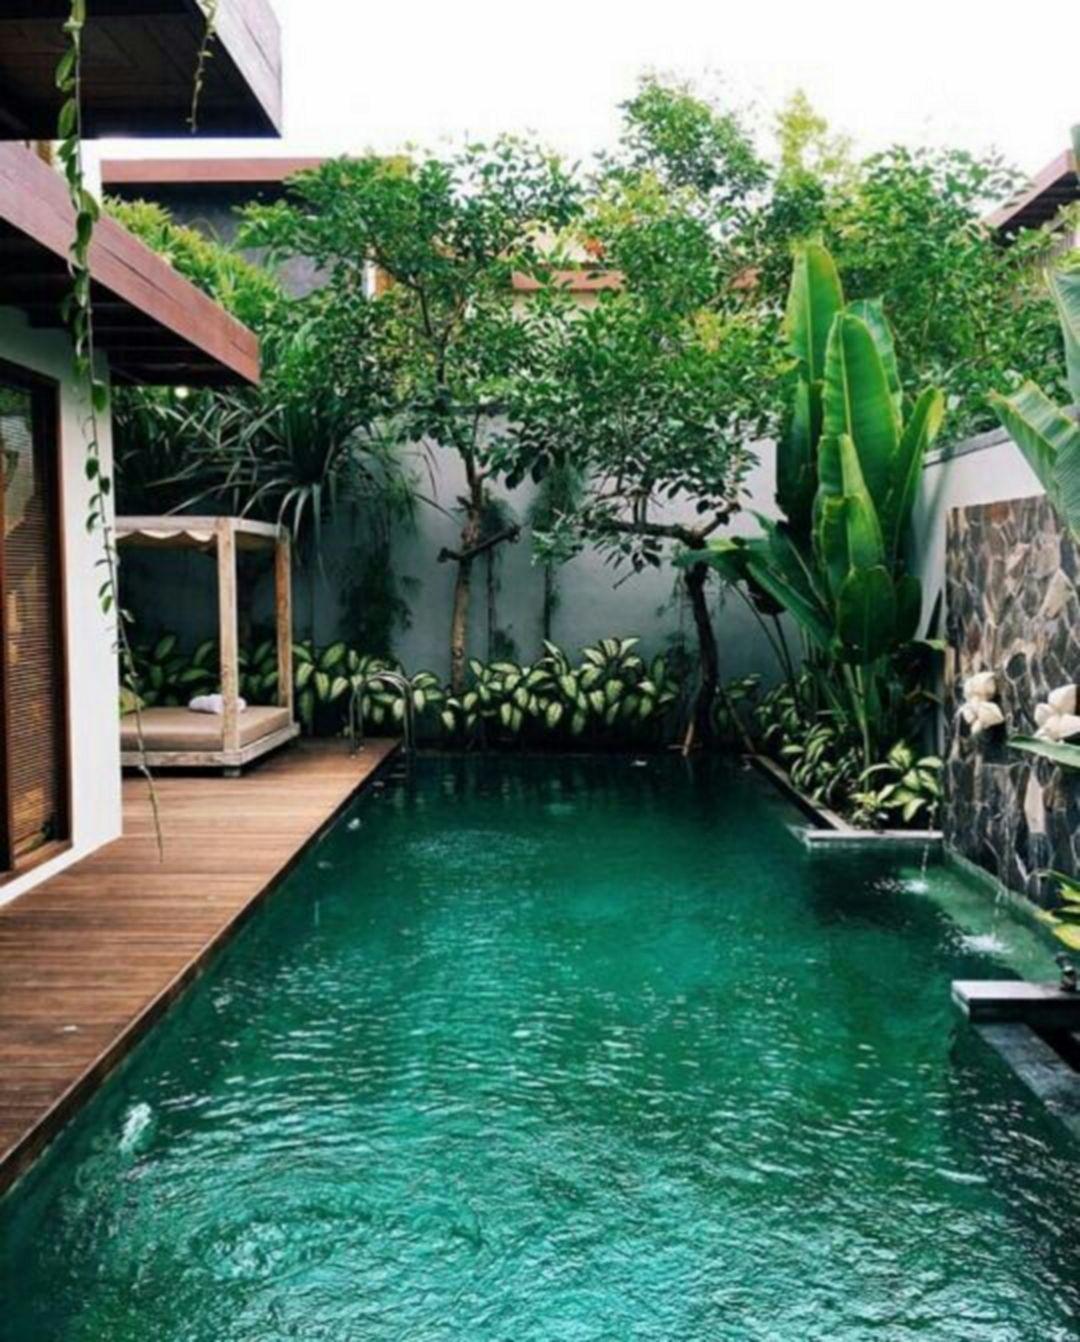 Marvelous Small Pool Design Ideas 1068 | Small Pools | Pinterest ...